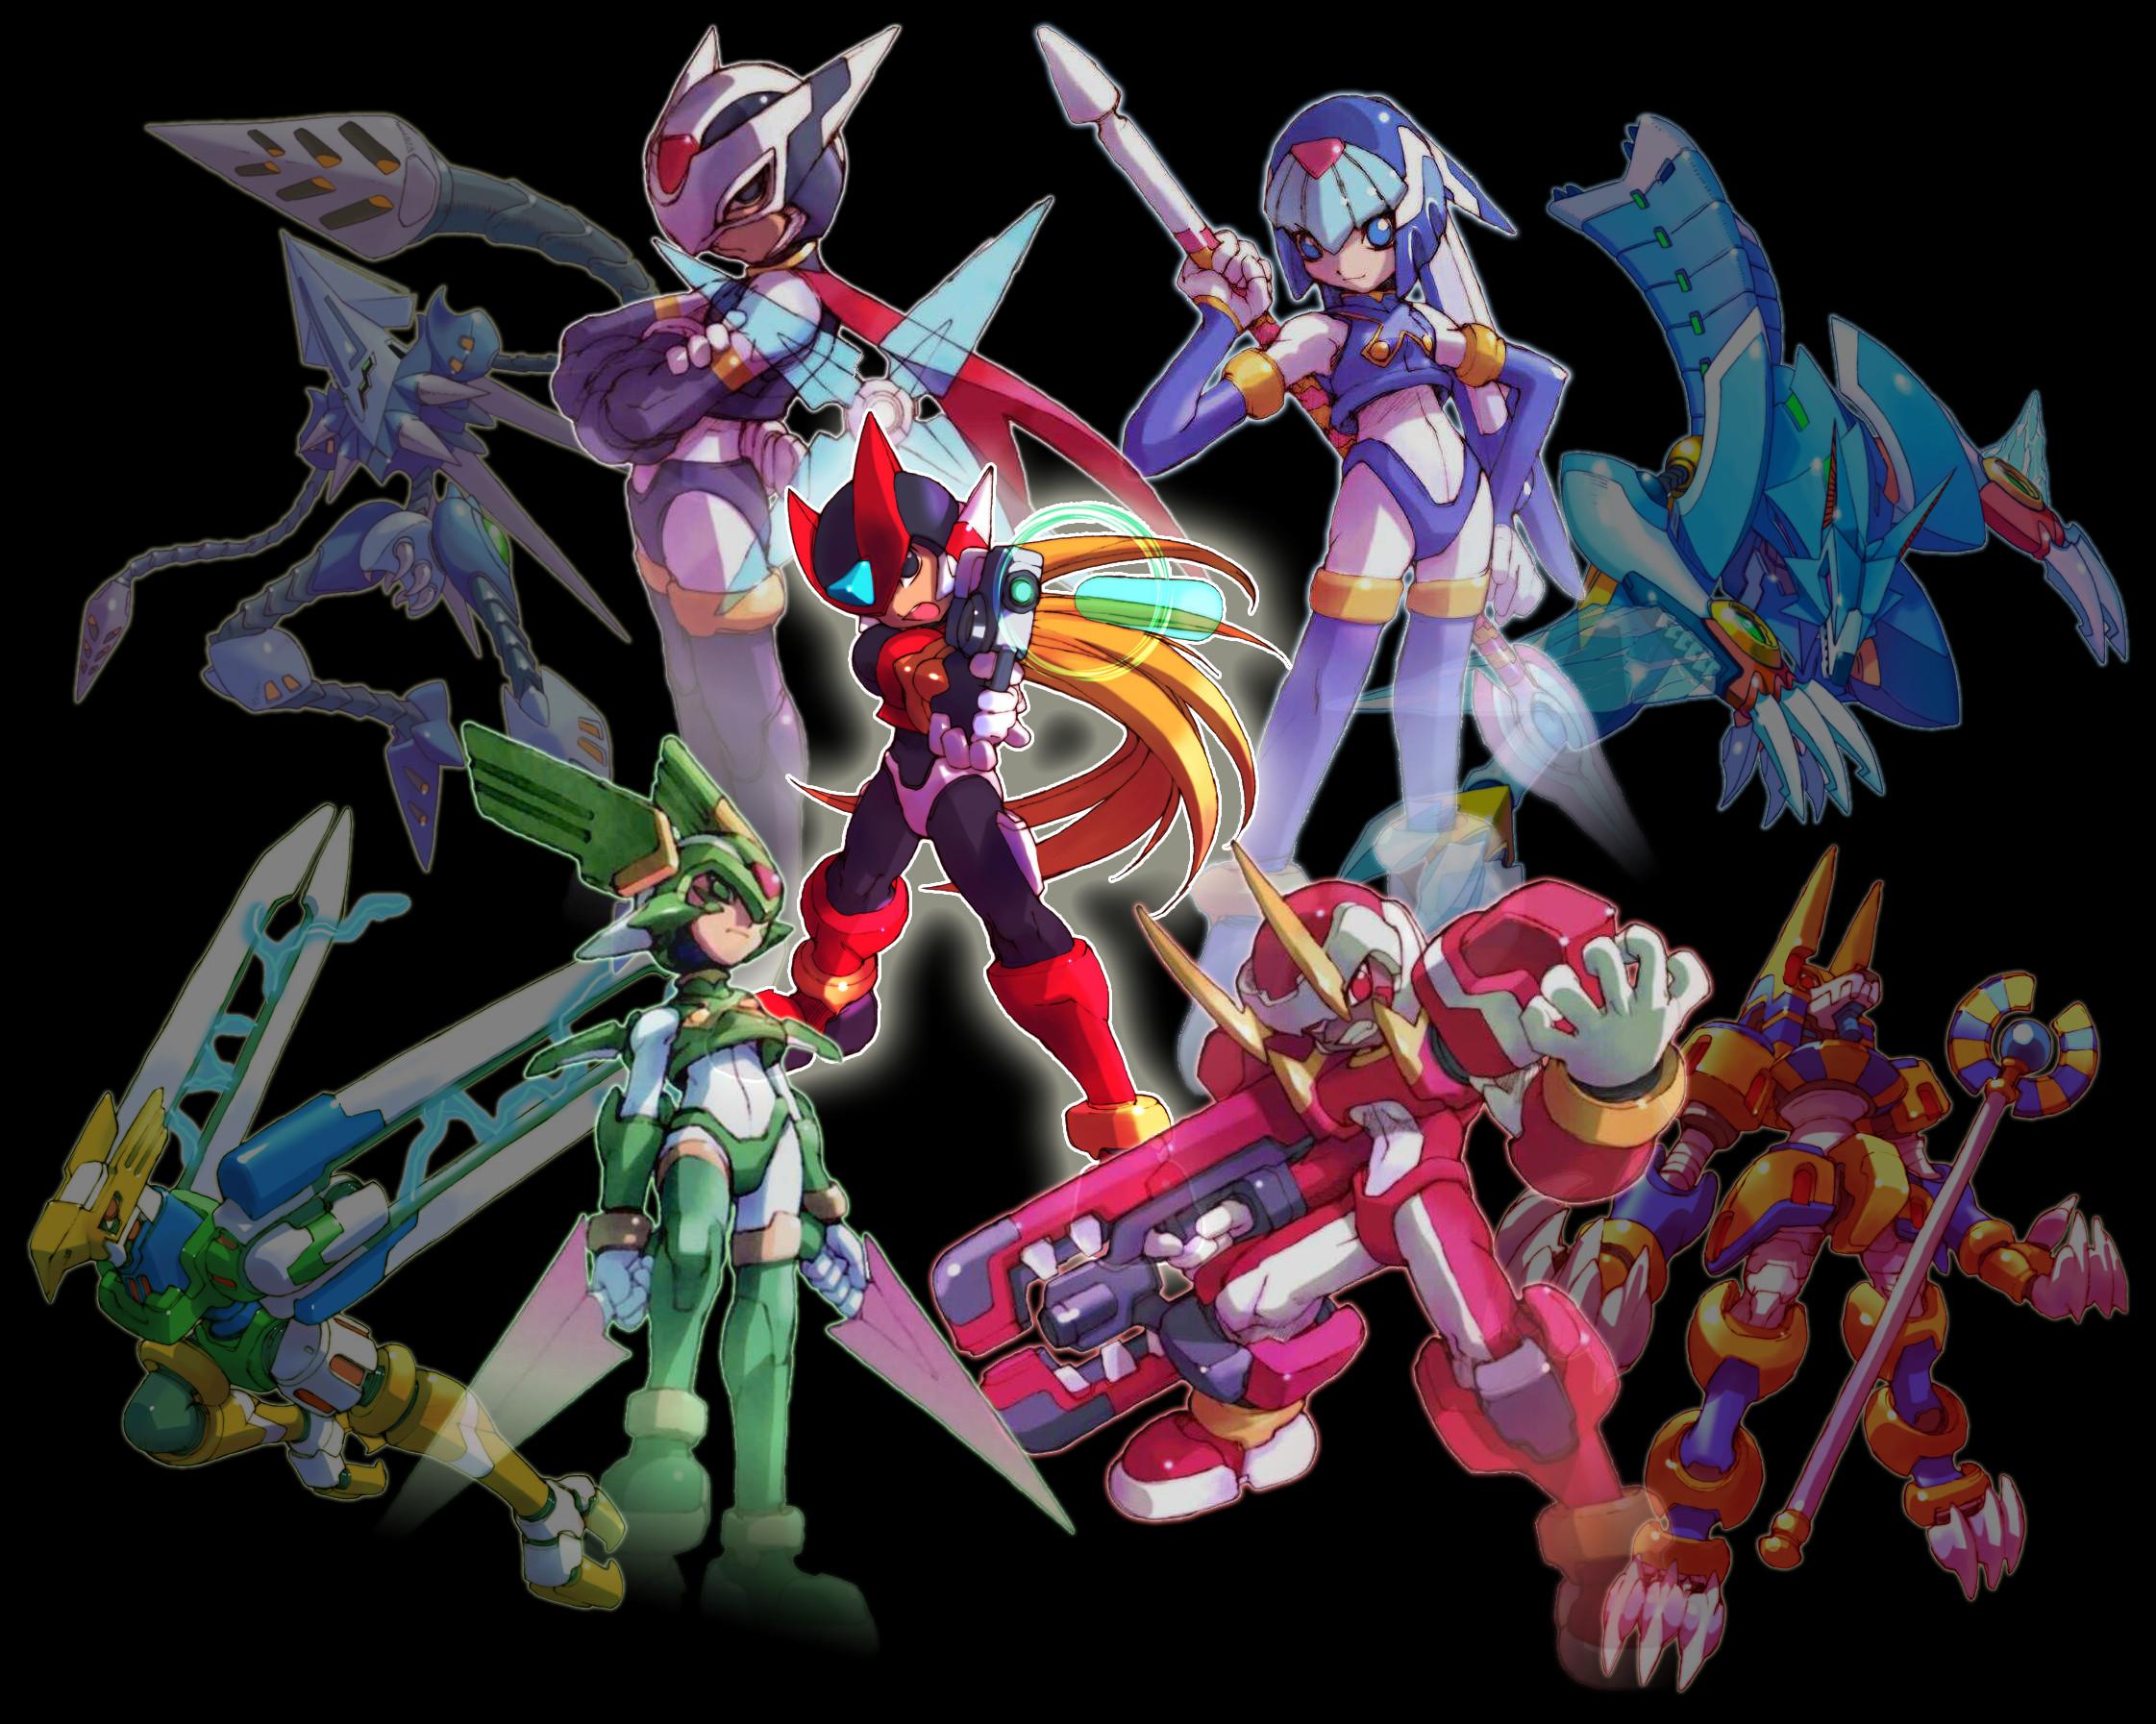 Megaman Zero Piece by bluesonic1 on DeviantArt